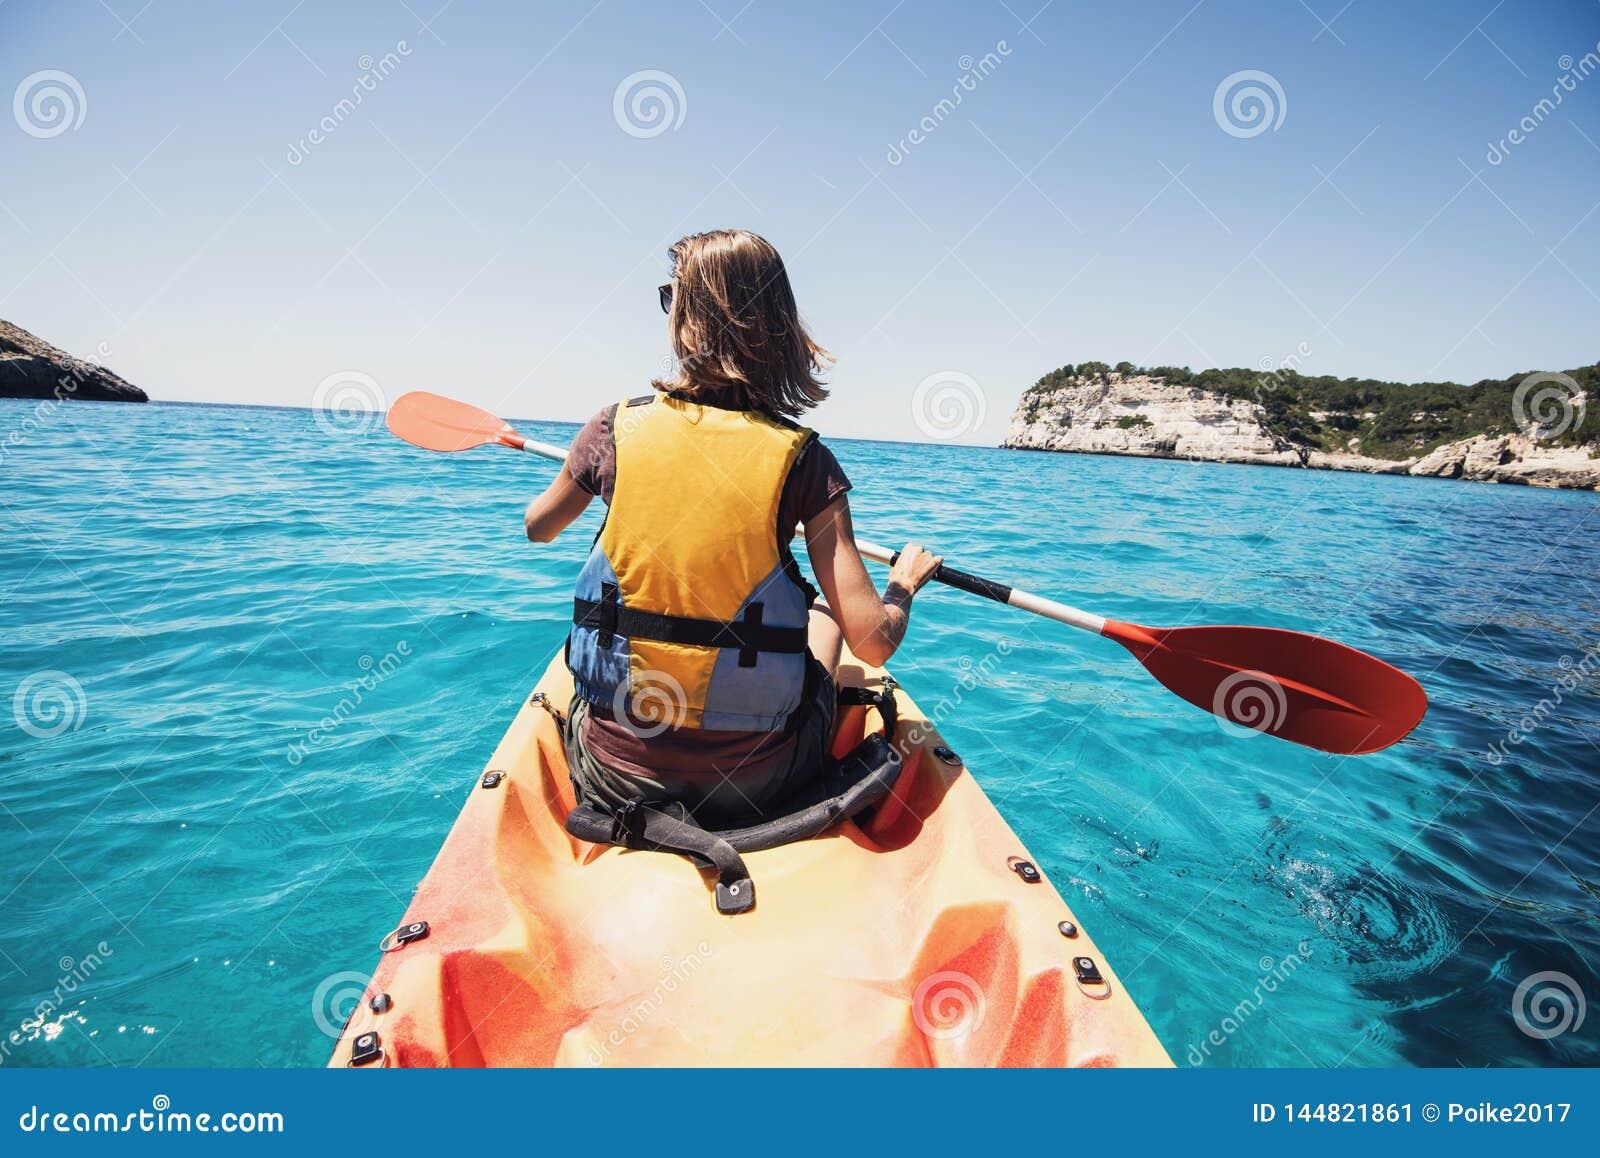 Jovem mulher que kayaking no mar Estilo de vida e conceito ativos do curso